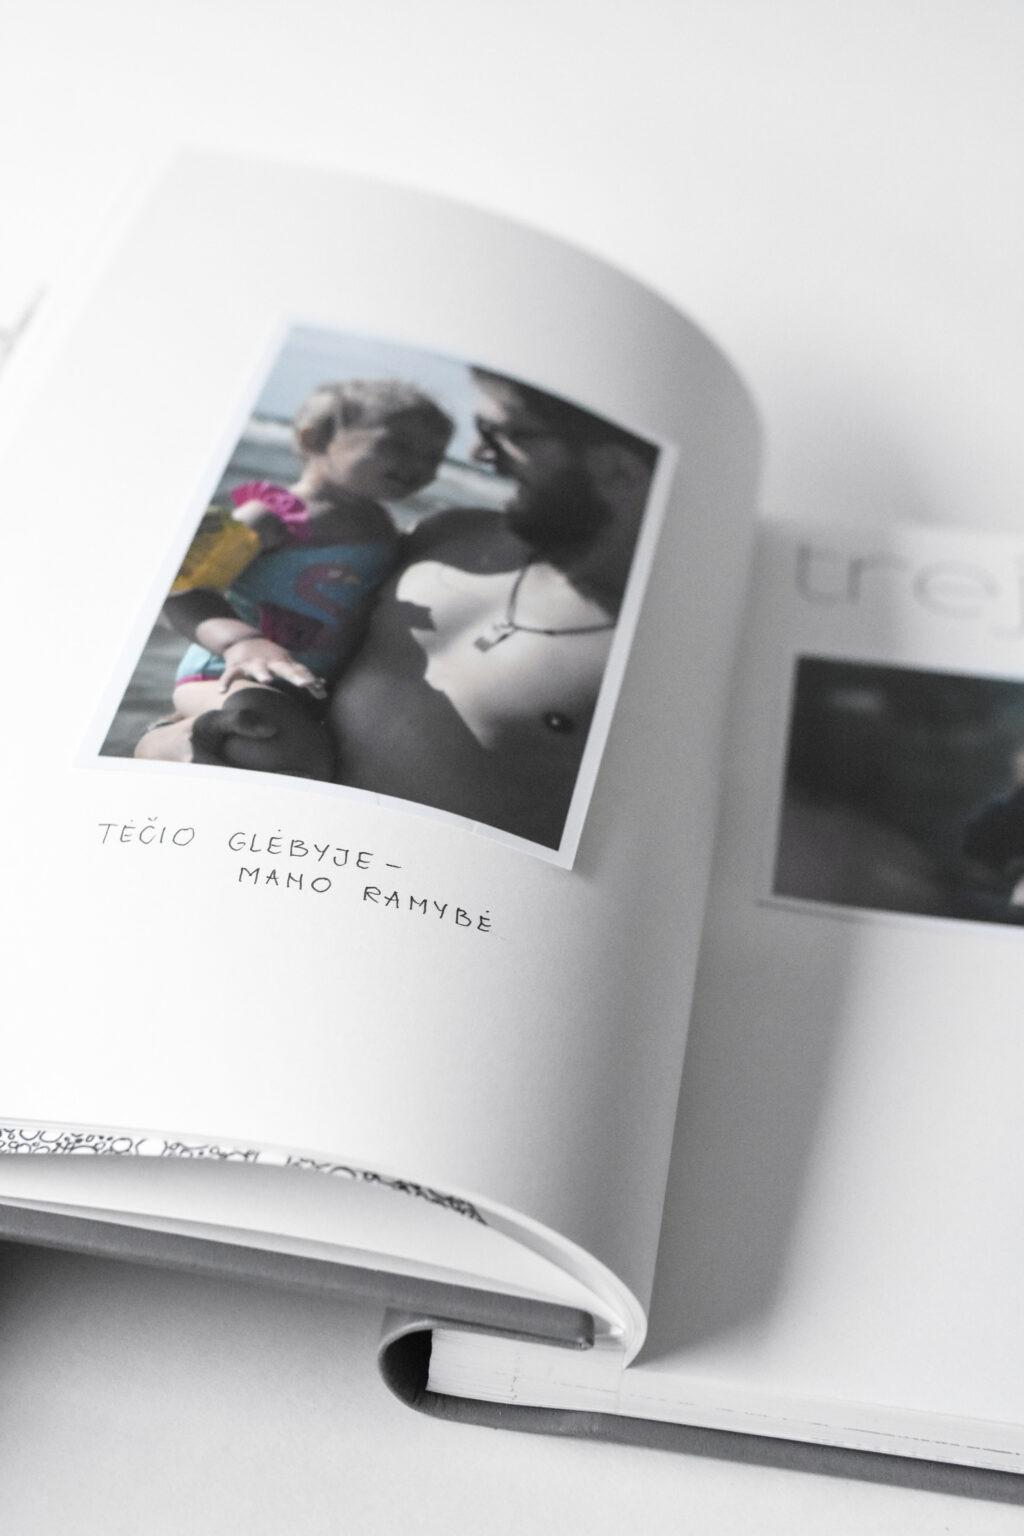 kudikio albumas, vaiko knyga, dovana vaikui, hugabook